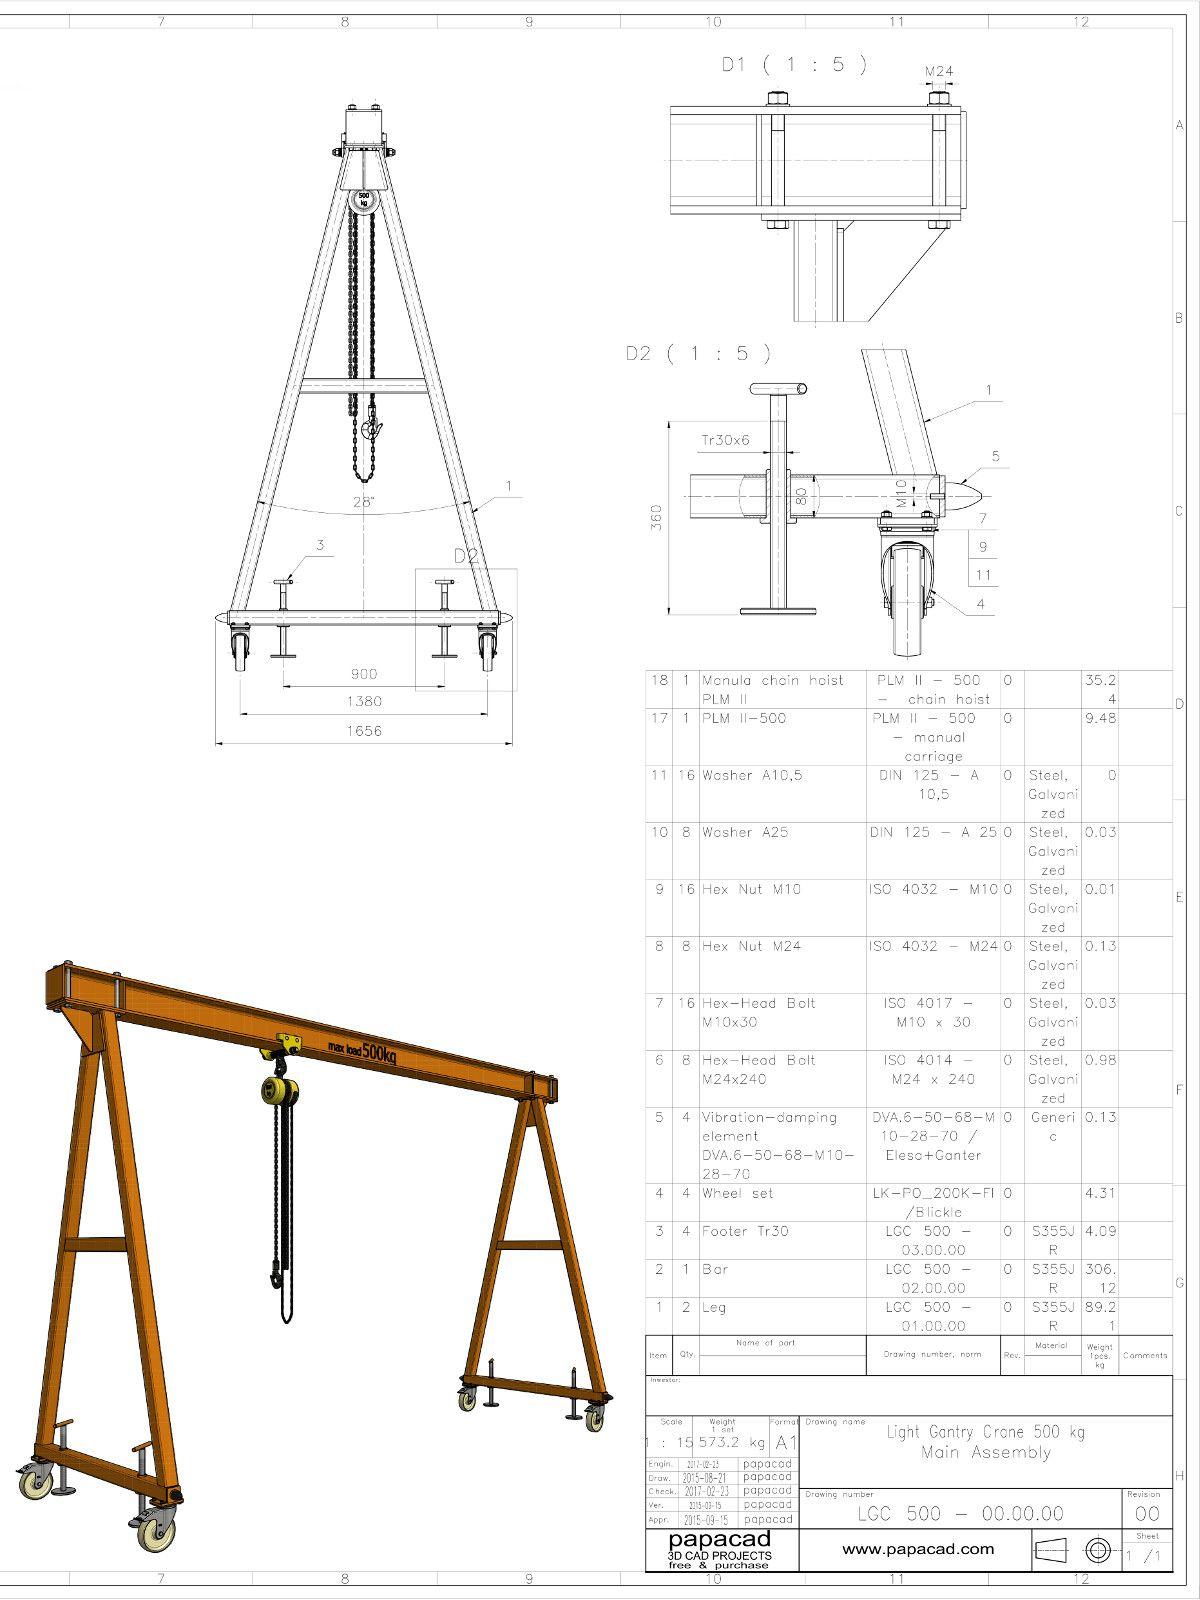 Samsung Portal Crane Diagram - Enthusiast Wiring Diagrams • on